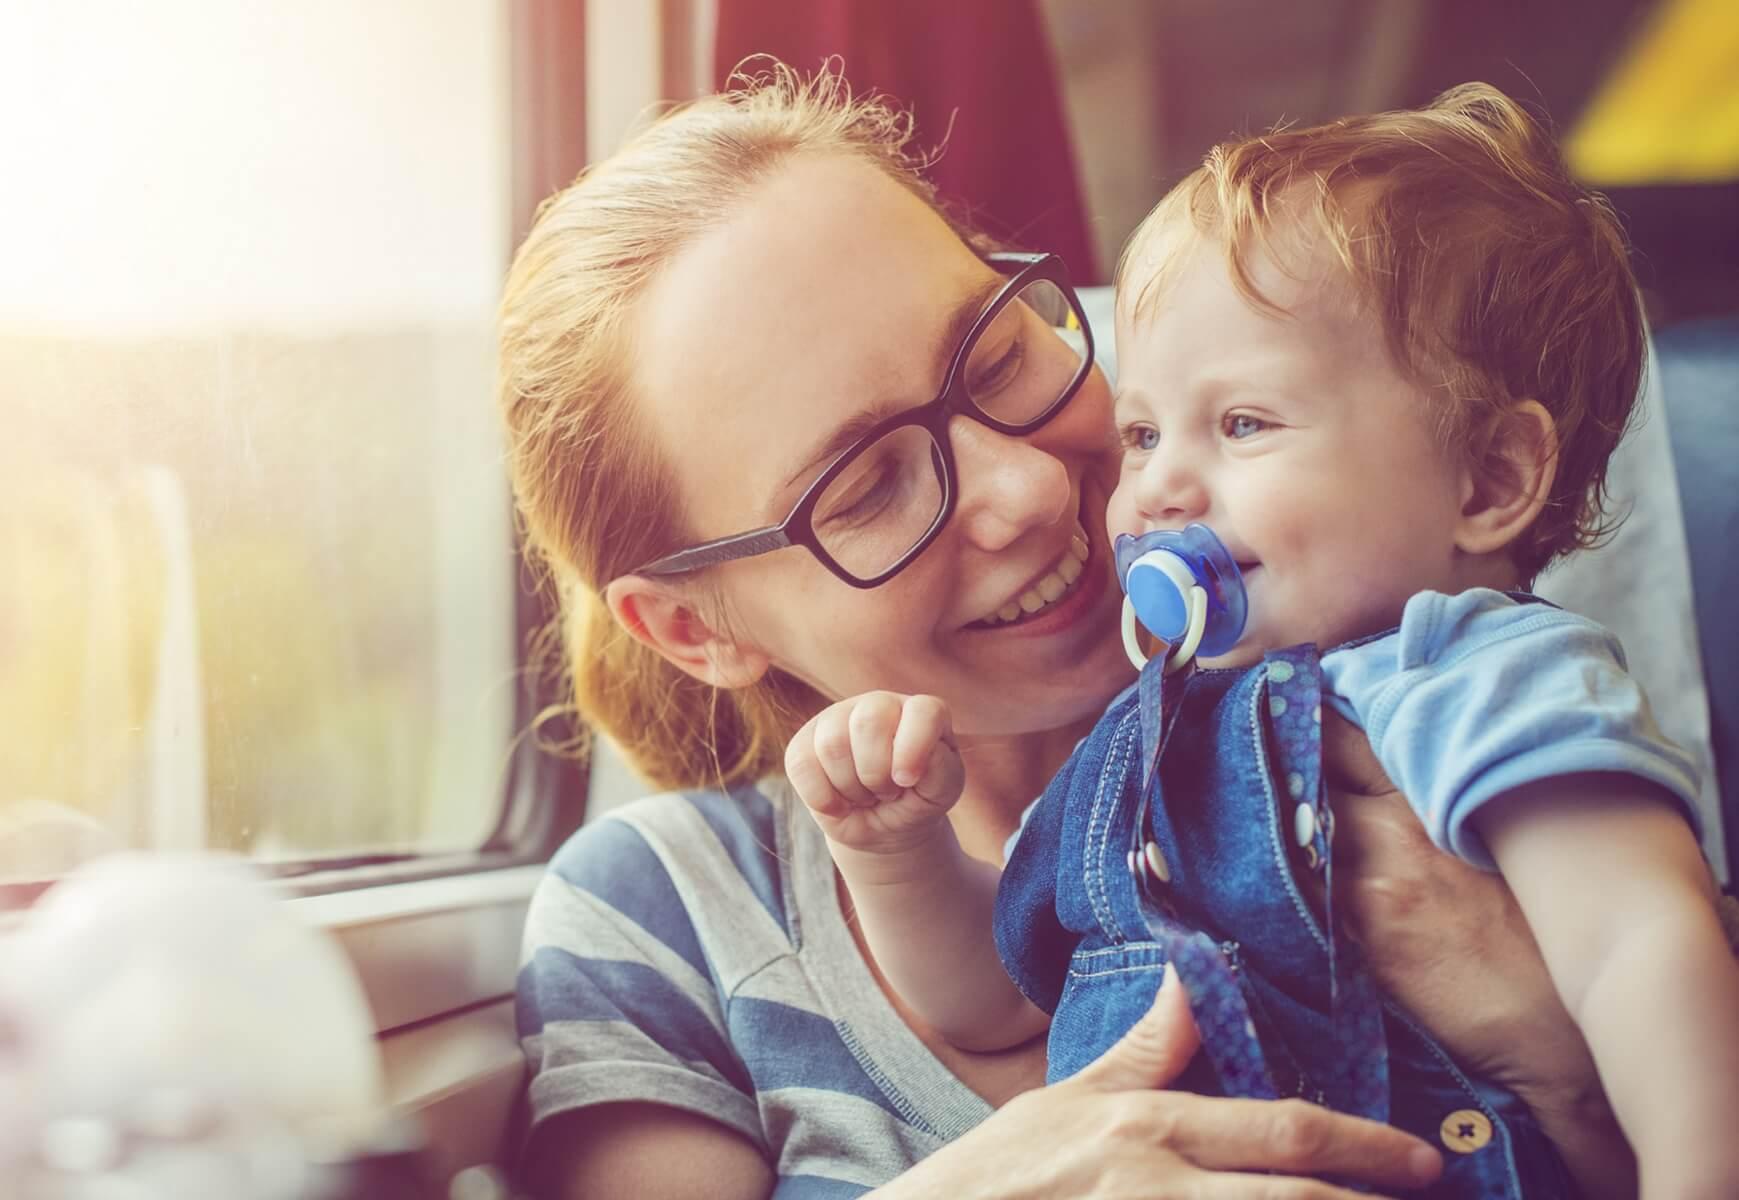 Family train travel | Caledonian SLeeper